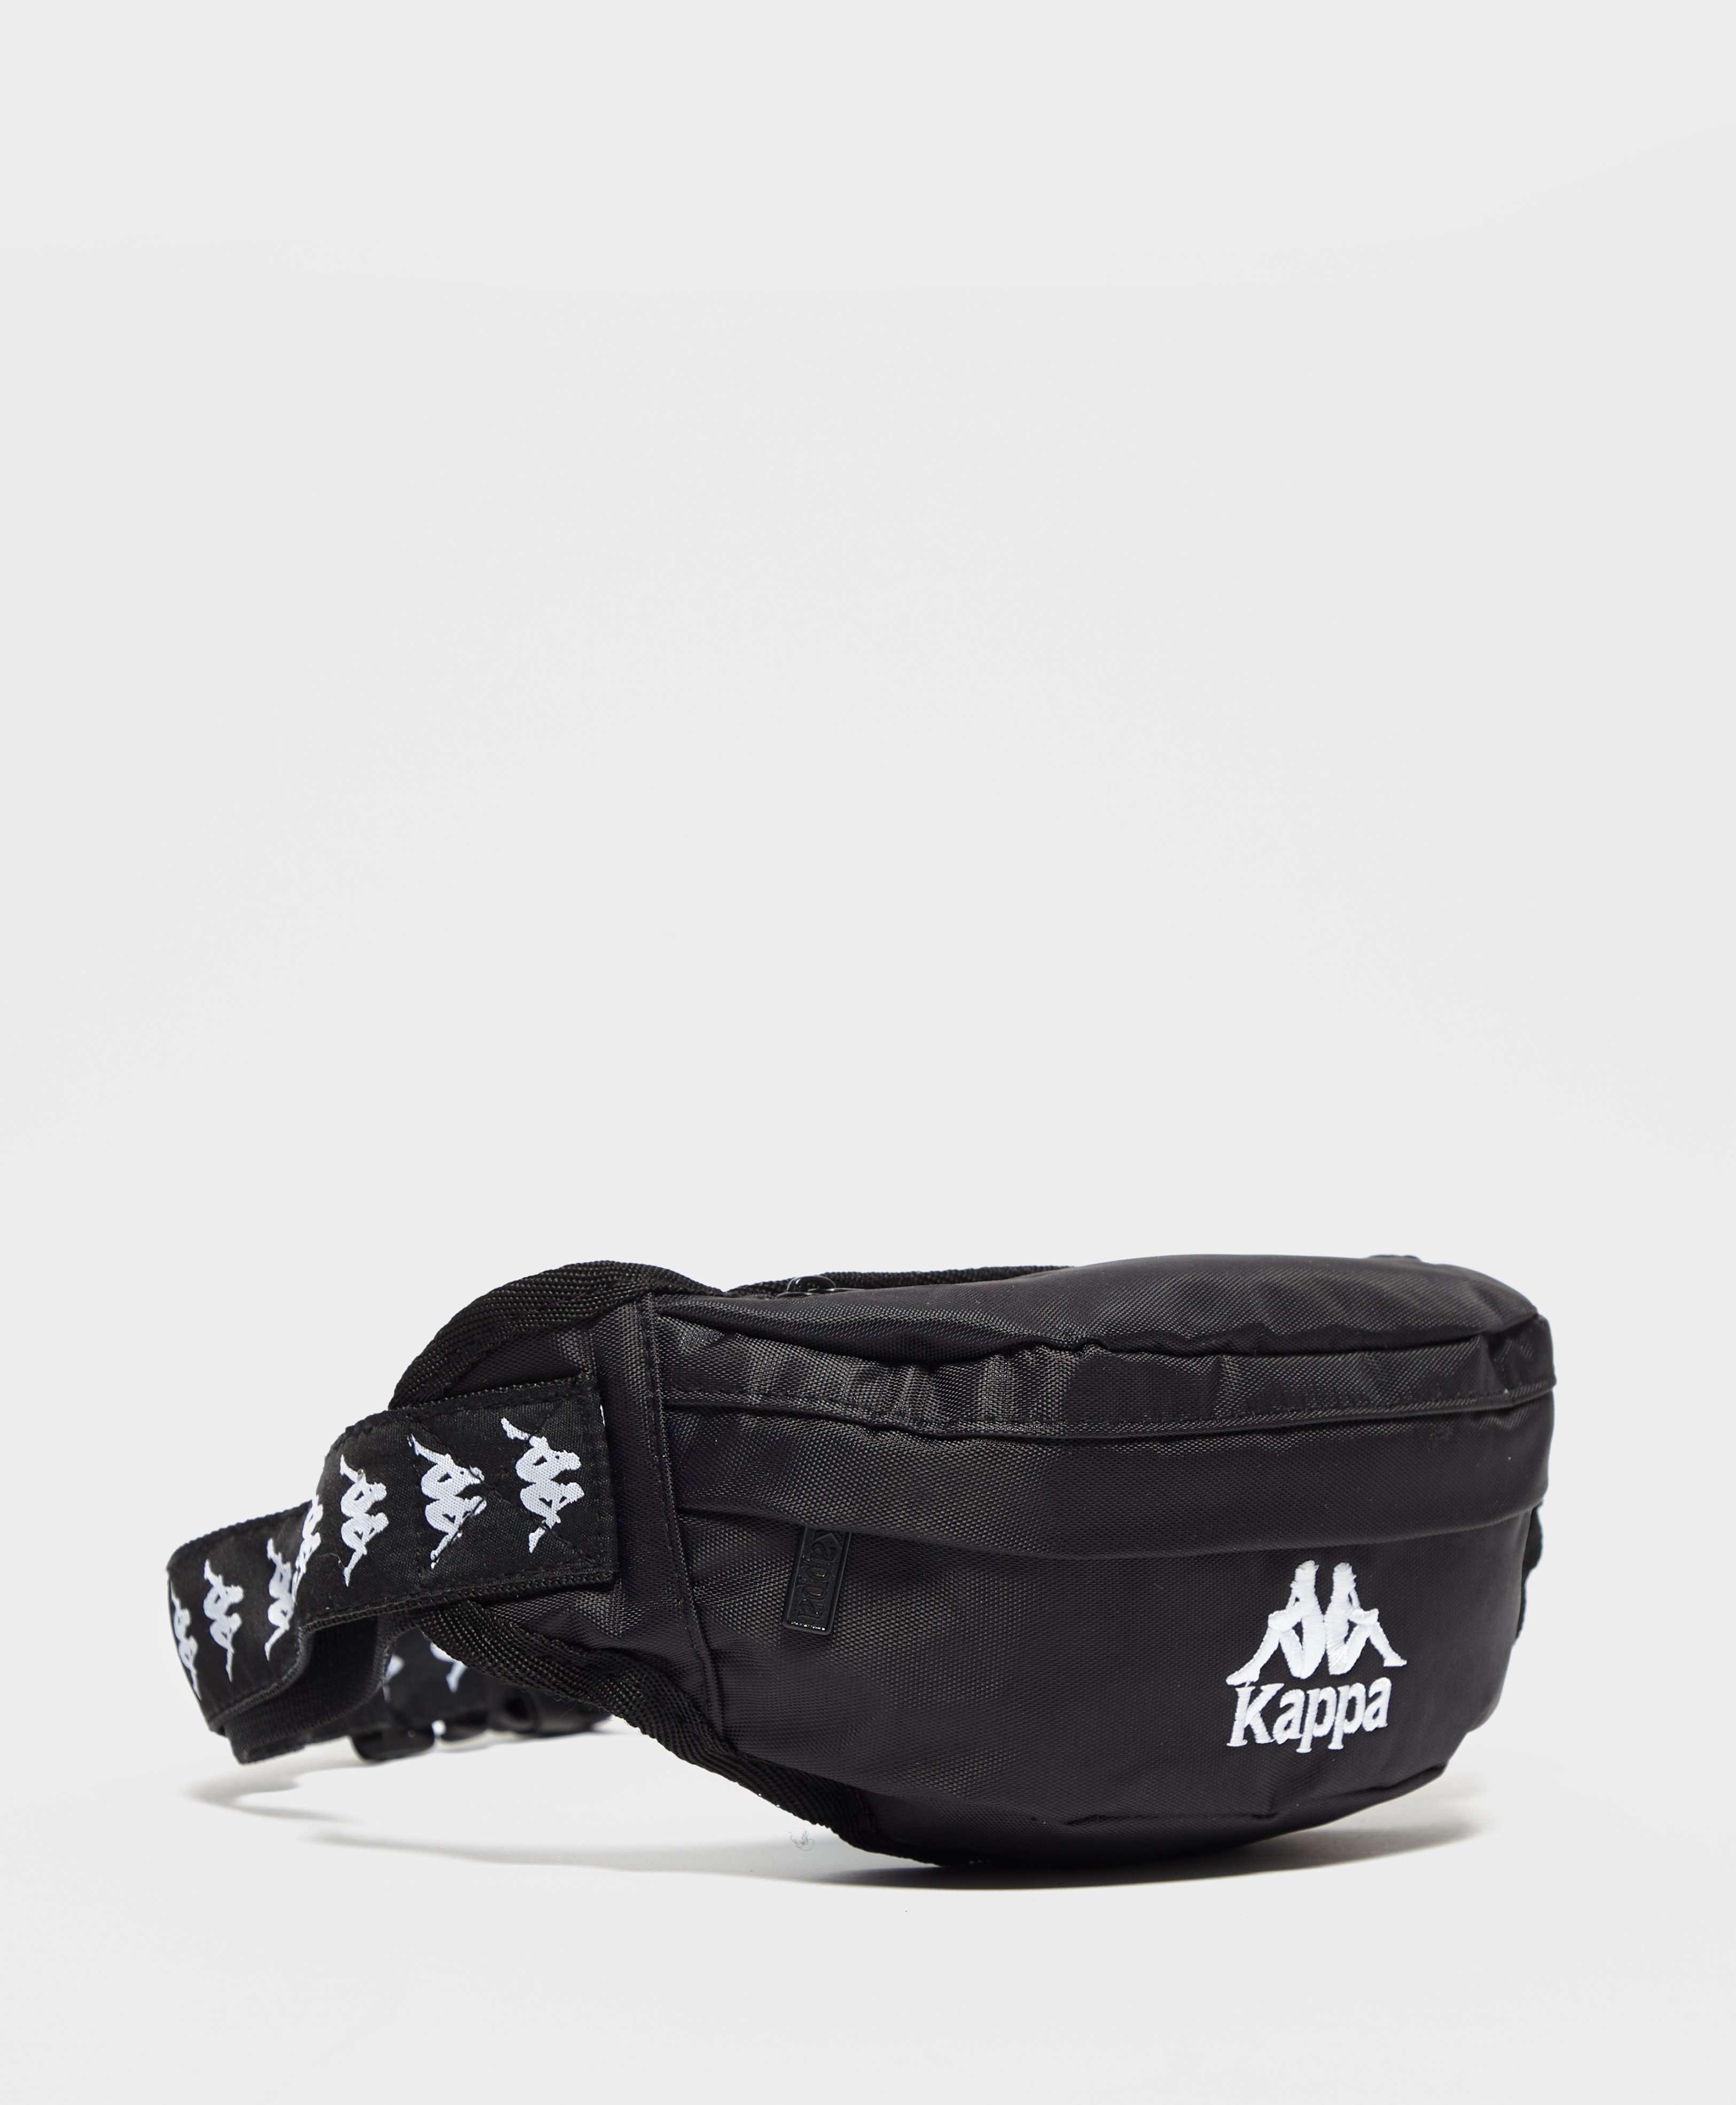 Kappa Anais Bum Bag